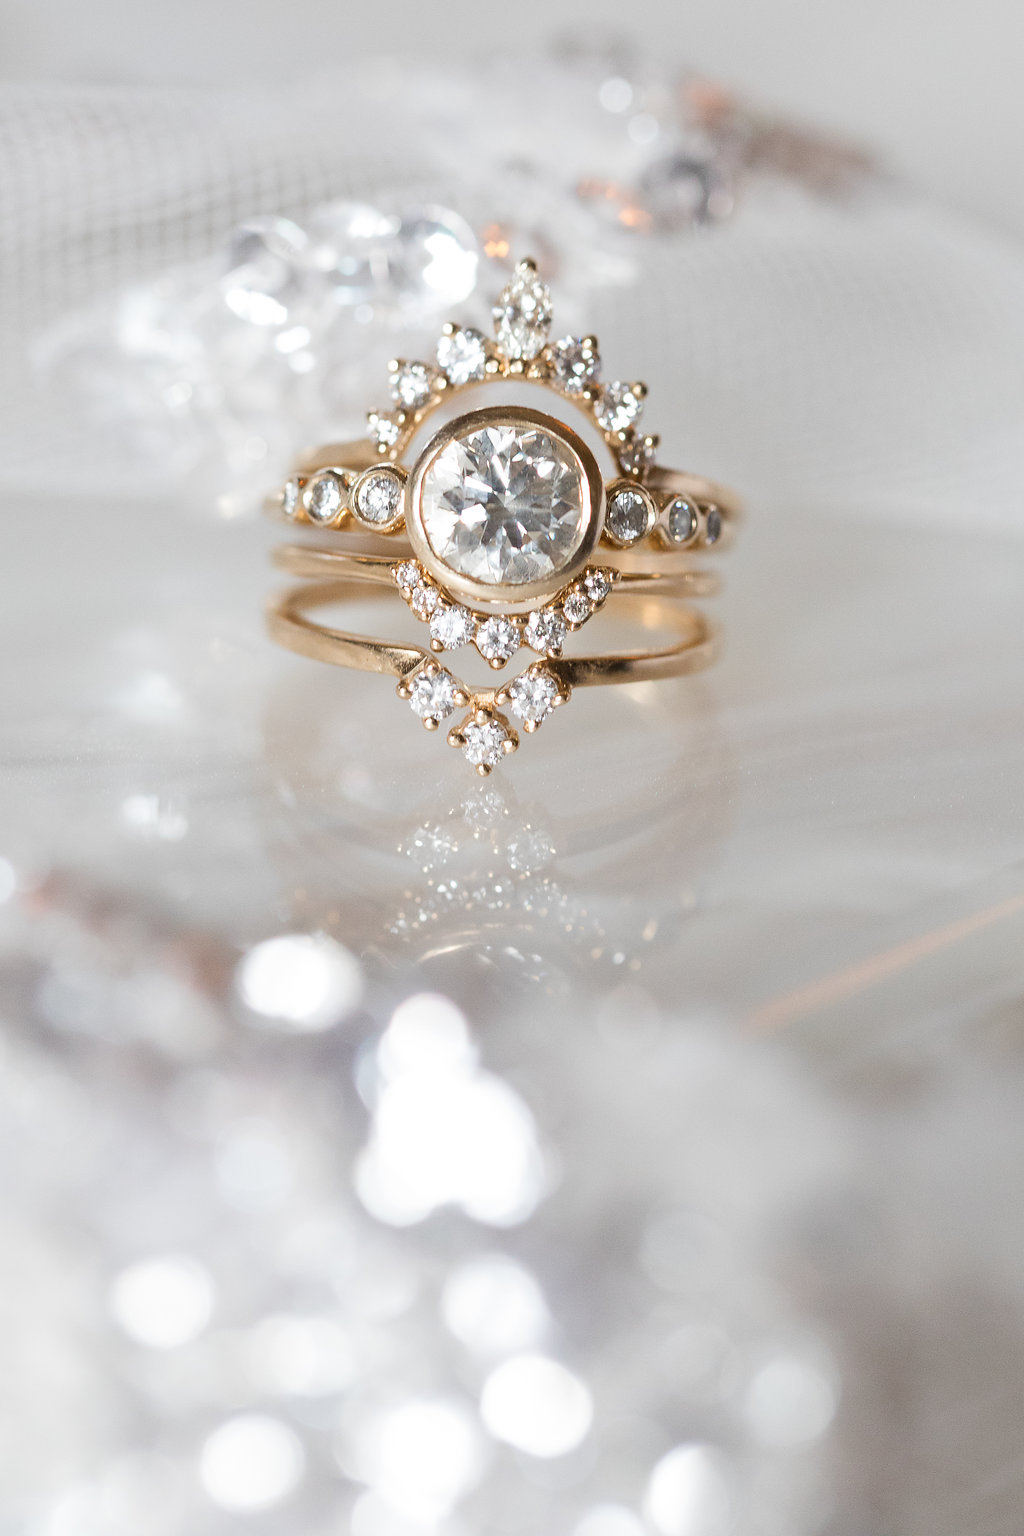 Vintage Diamond Rings // Blackberry Farm // Nashville + Tennessee Wedding Floral Design